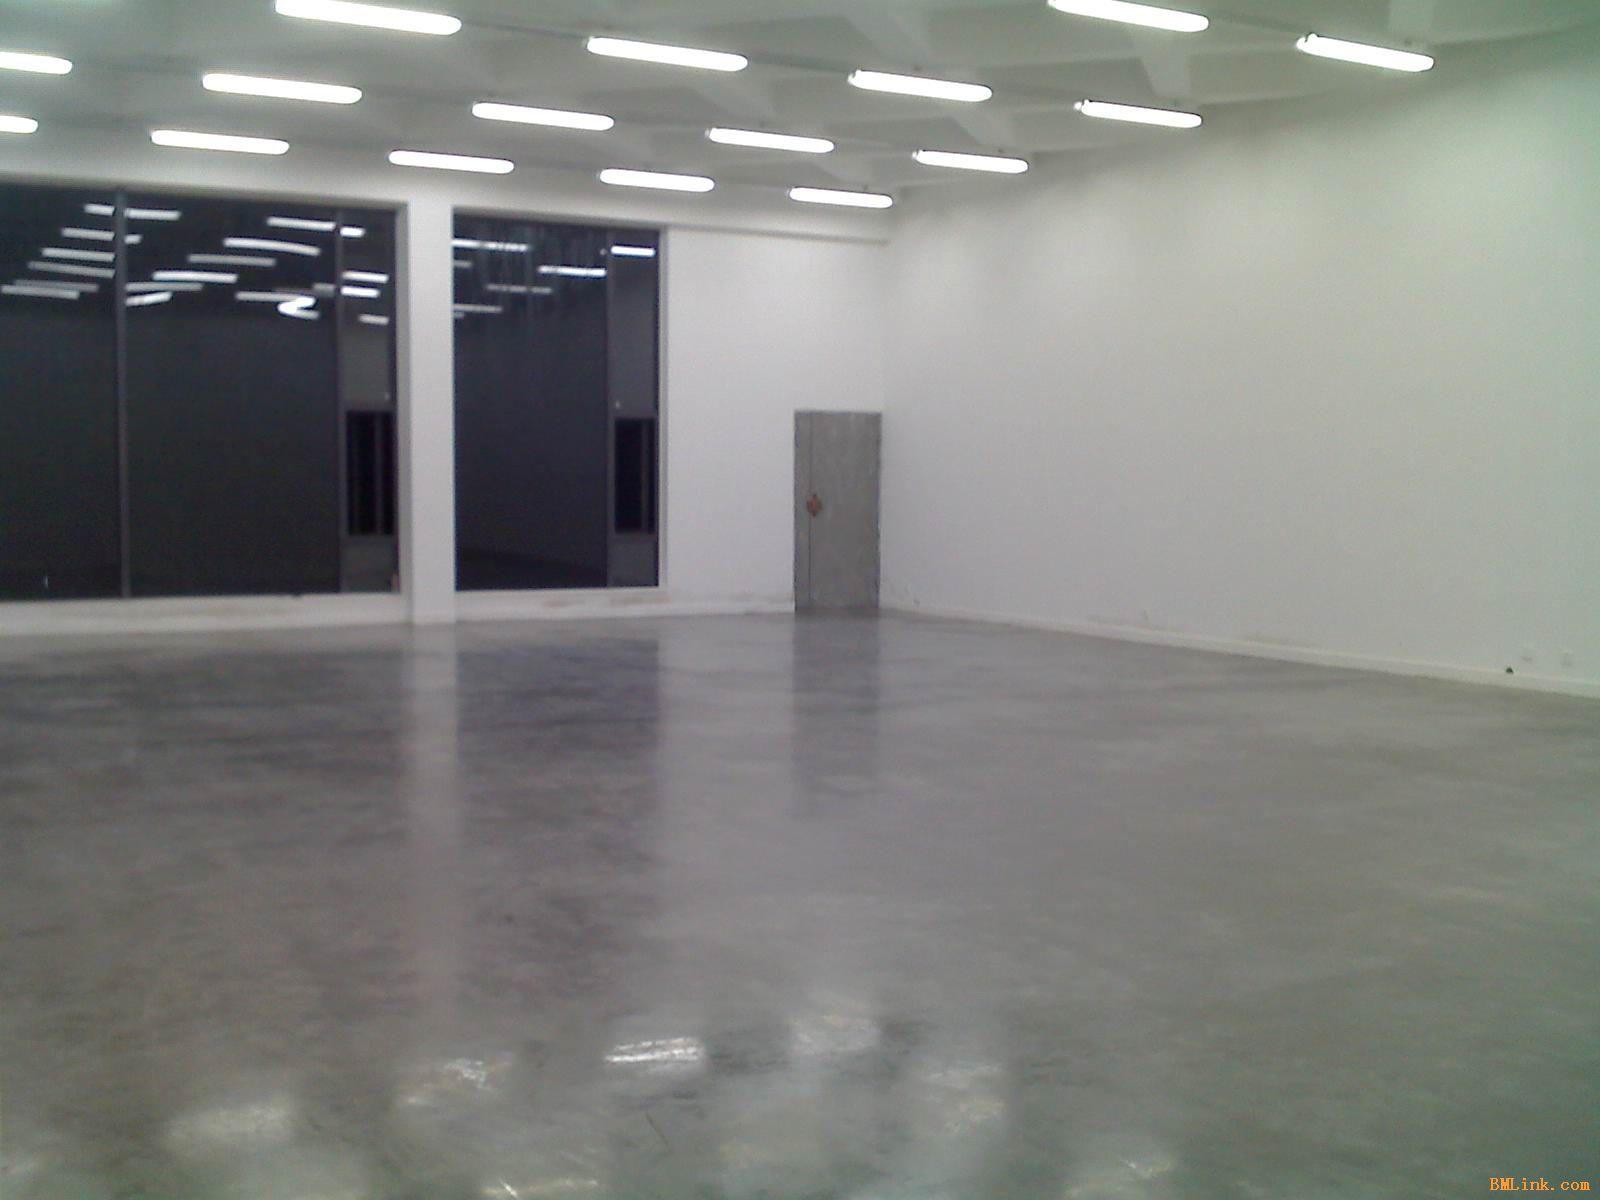 Epoxy Paint Wood Floor Maydos Lithium Silicate Floor Hardener Liquid Concrete ...